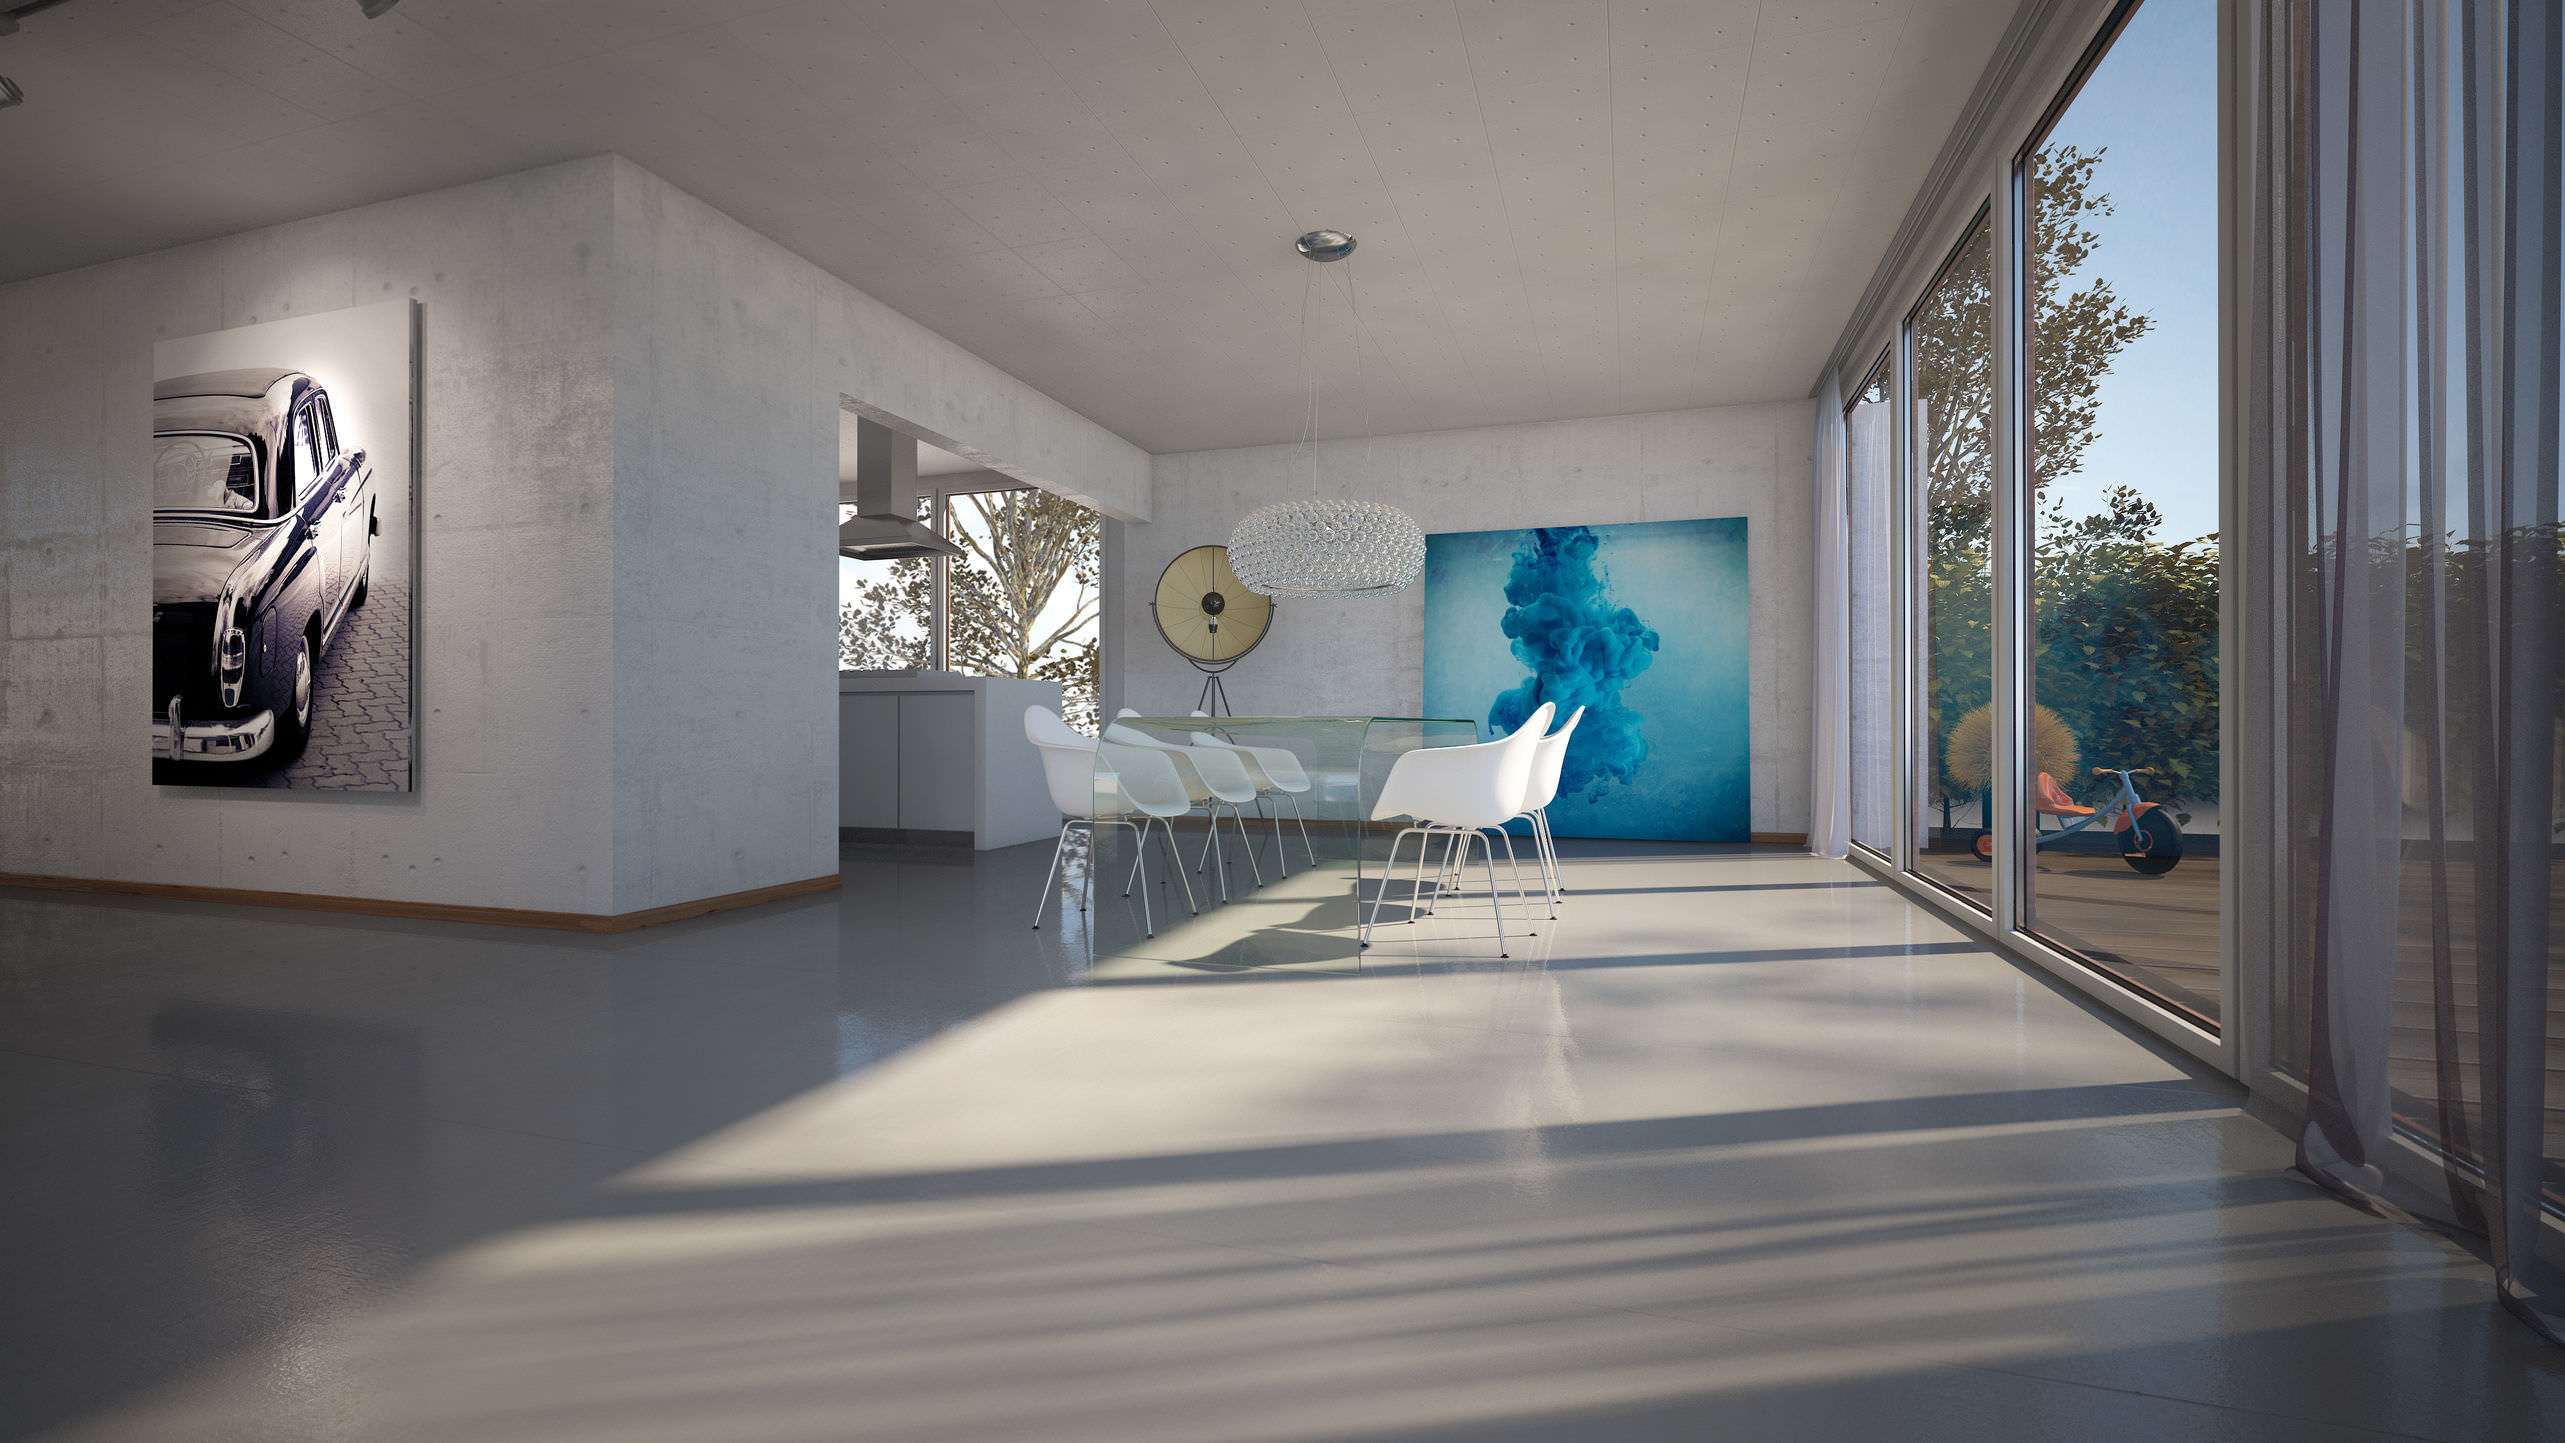 Prix Beton Ciré Sol smoothing mortar / for flooring screed - bÉton lissÉ